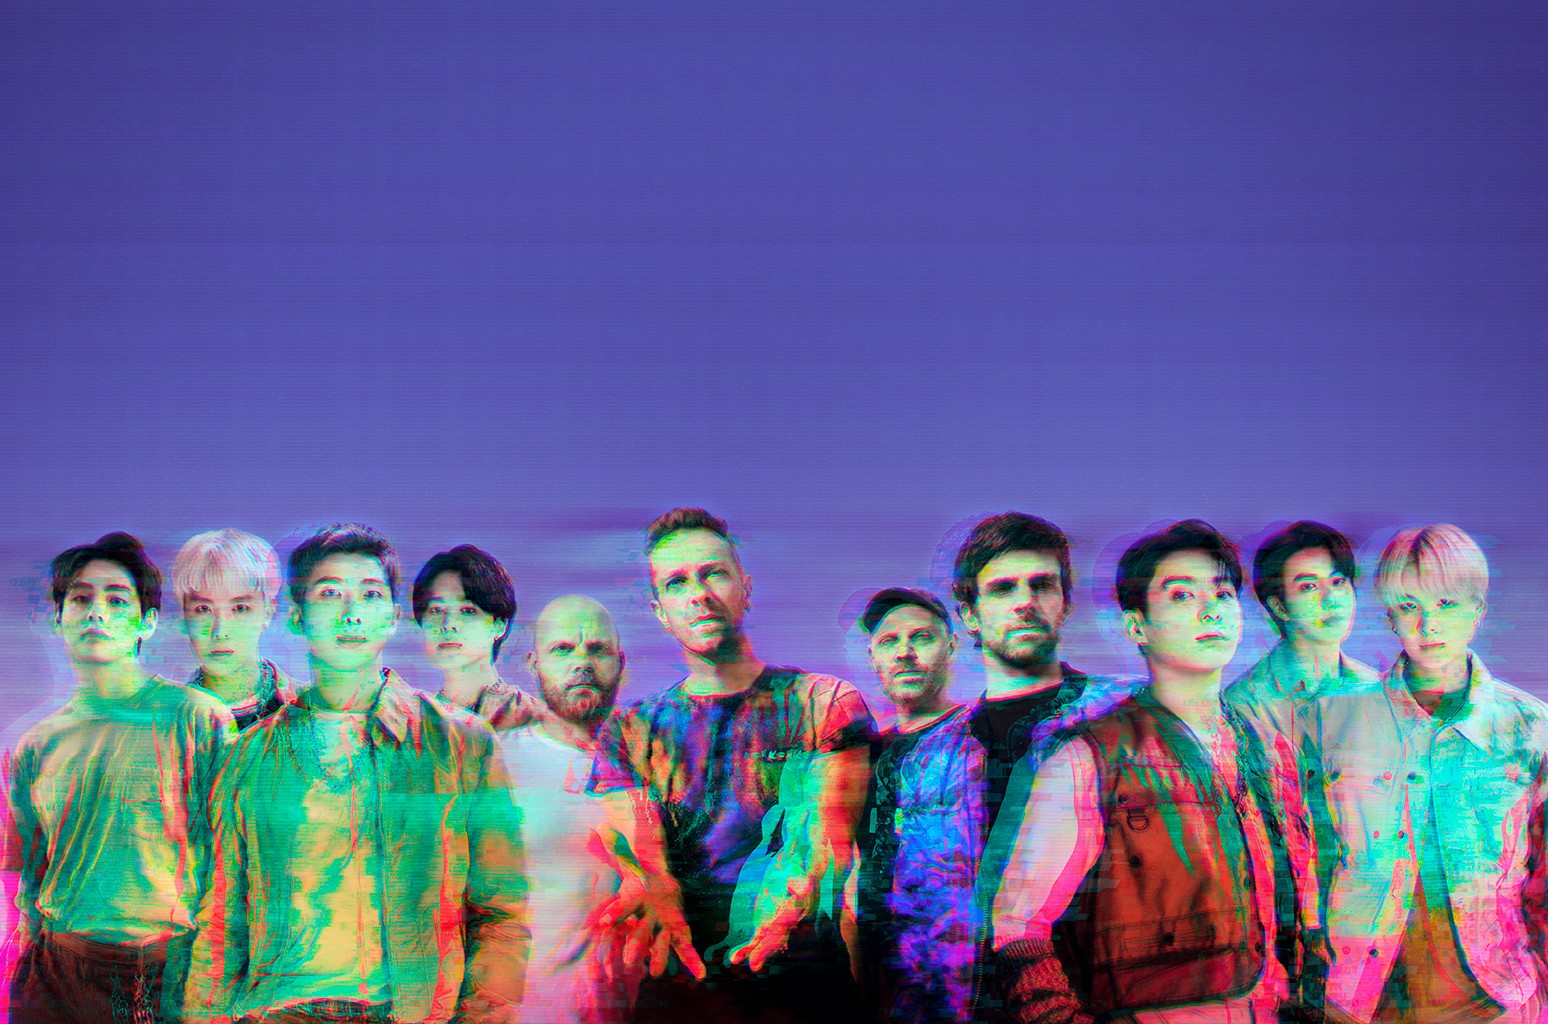 BTS and Coldplay My Universe Tiktok clip